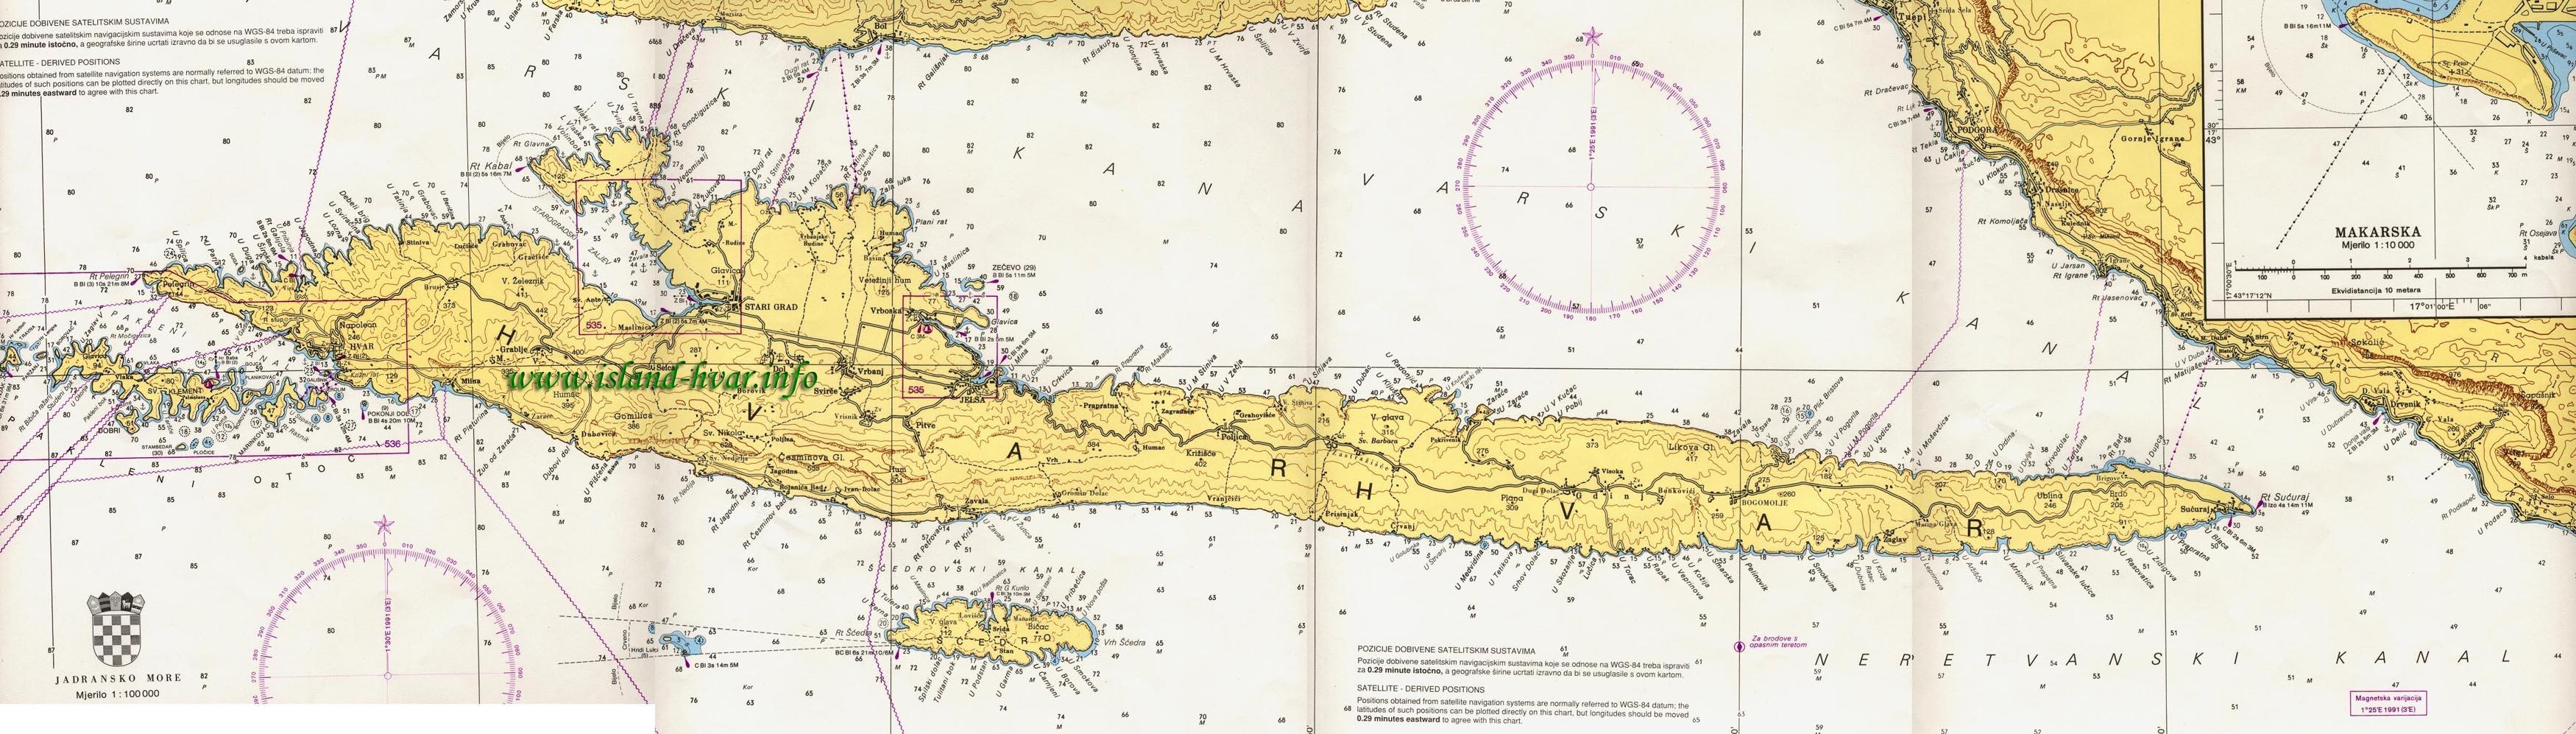 hvar mapa Island Hvar.info   How to reach Hvar? hvar mapa